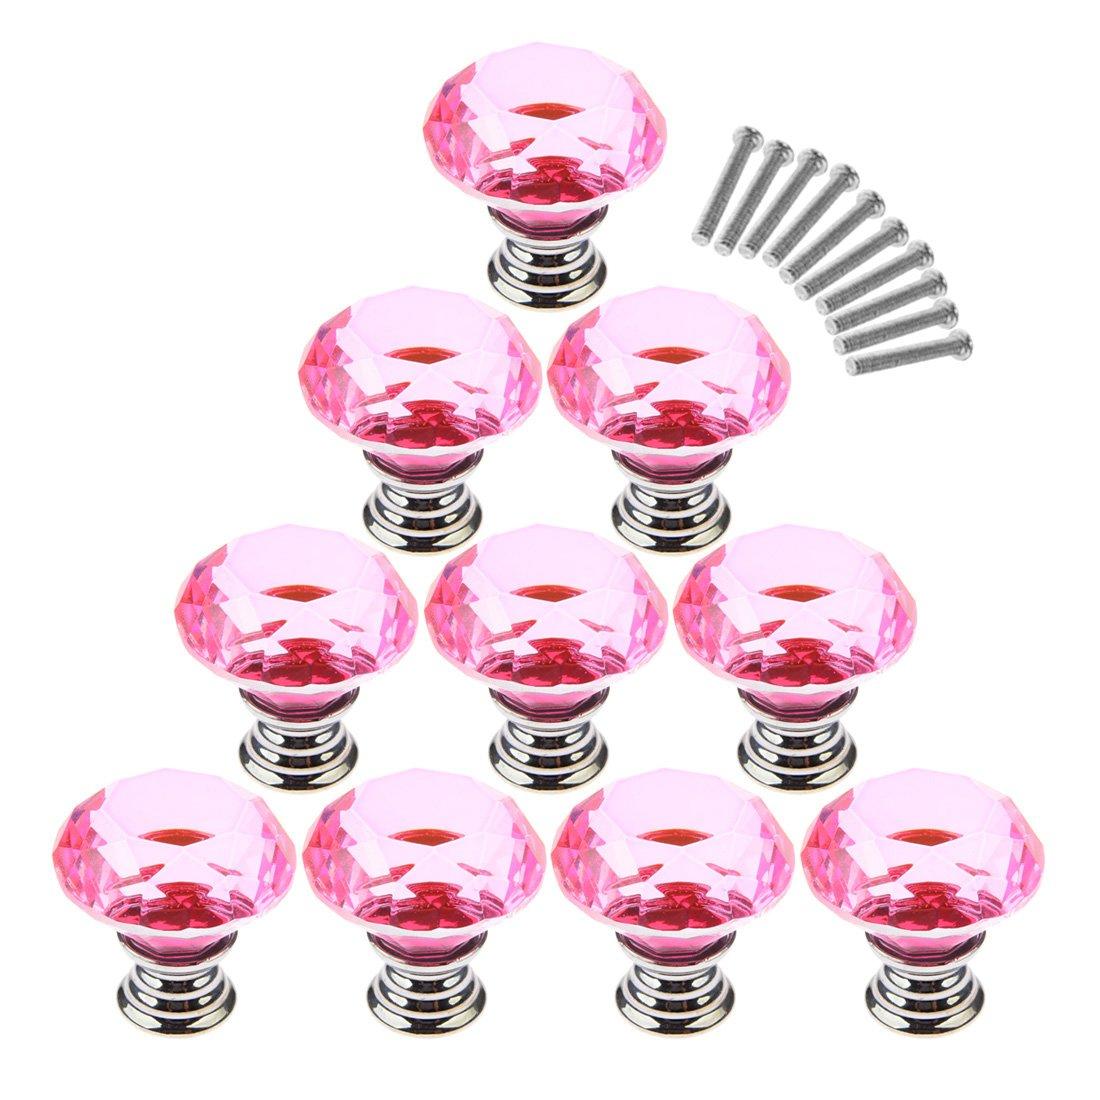 Haoun 10 Pcs Dresser Knobs, Crystal Glass Cabinet Knobs 30mm Diamond Shape Drawer Pulls Handles - Pink